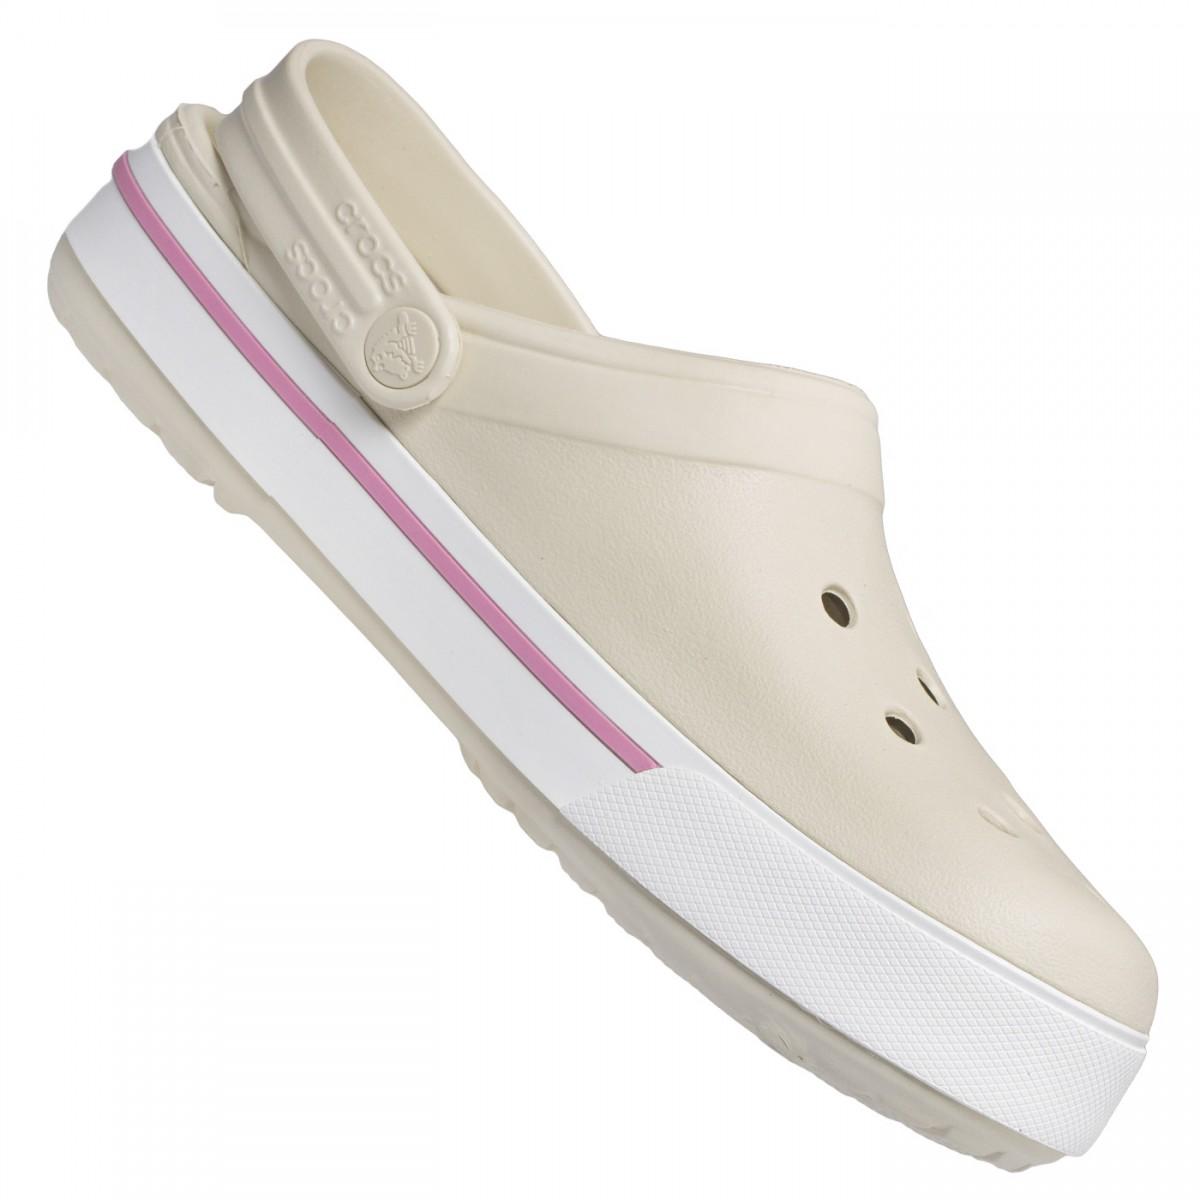 e2bc95ec3e Sandália Crocs Crocband 2